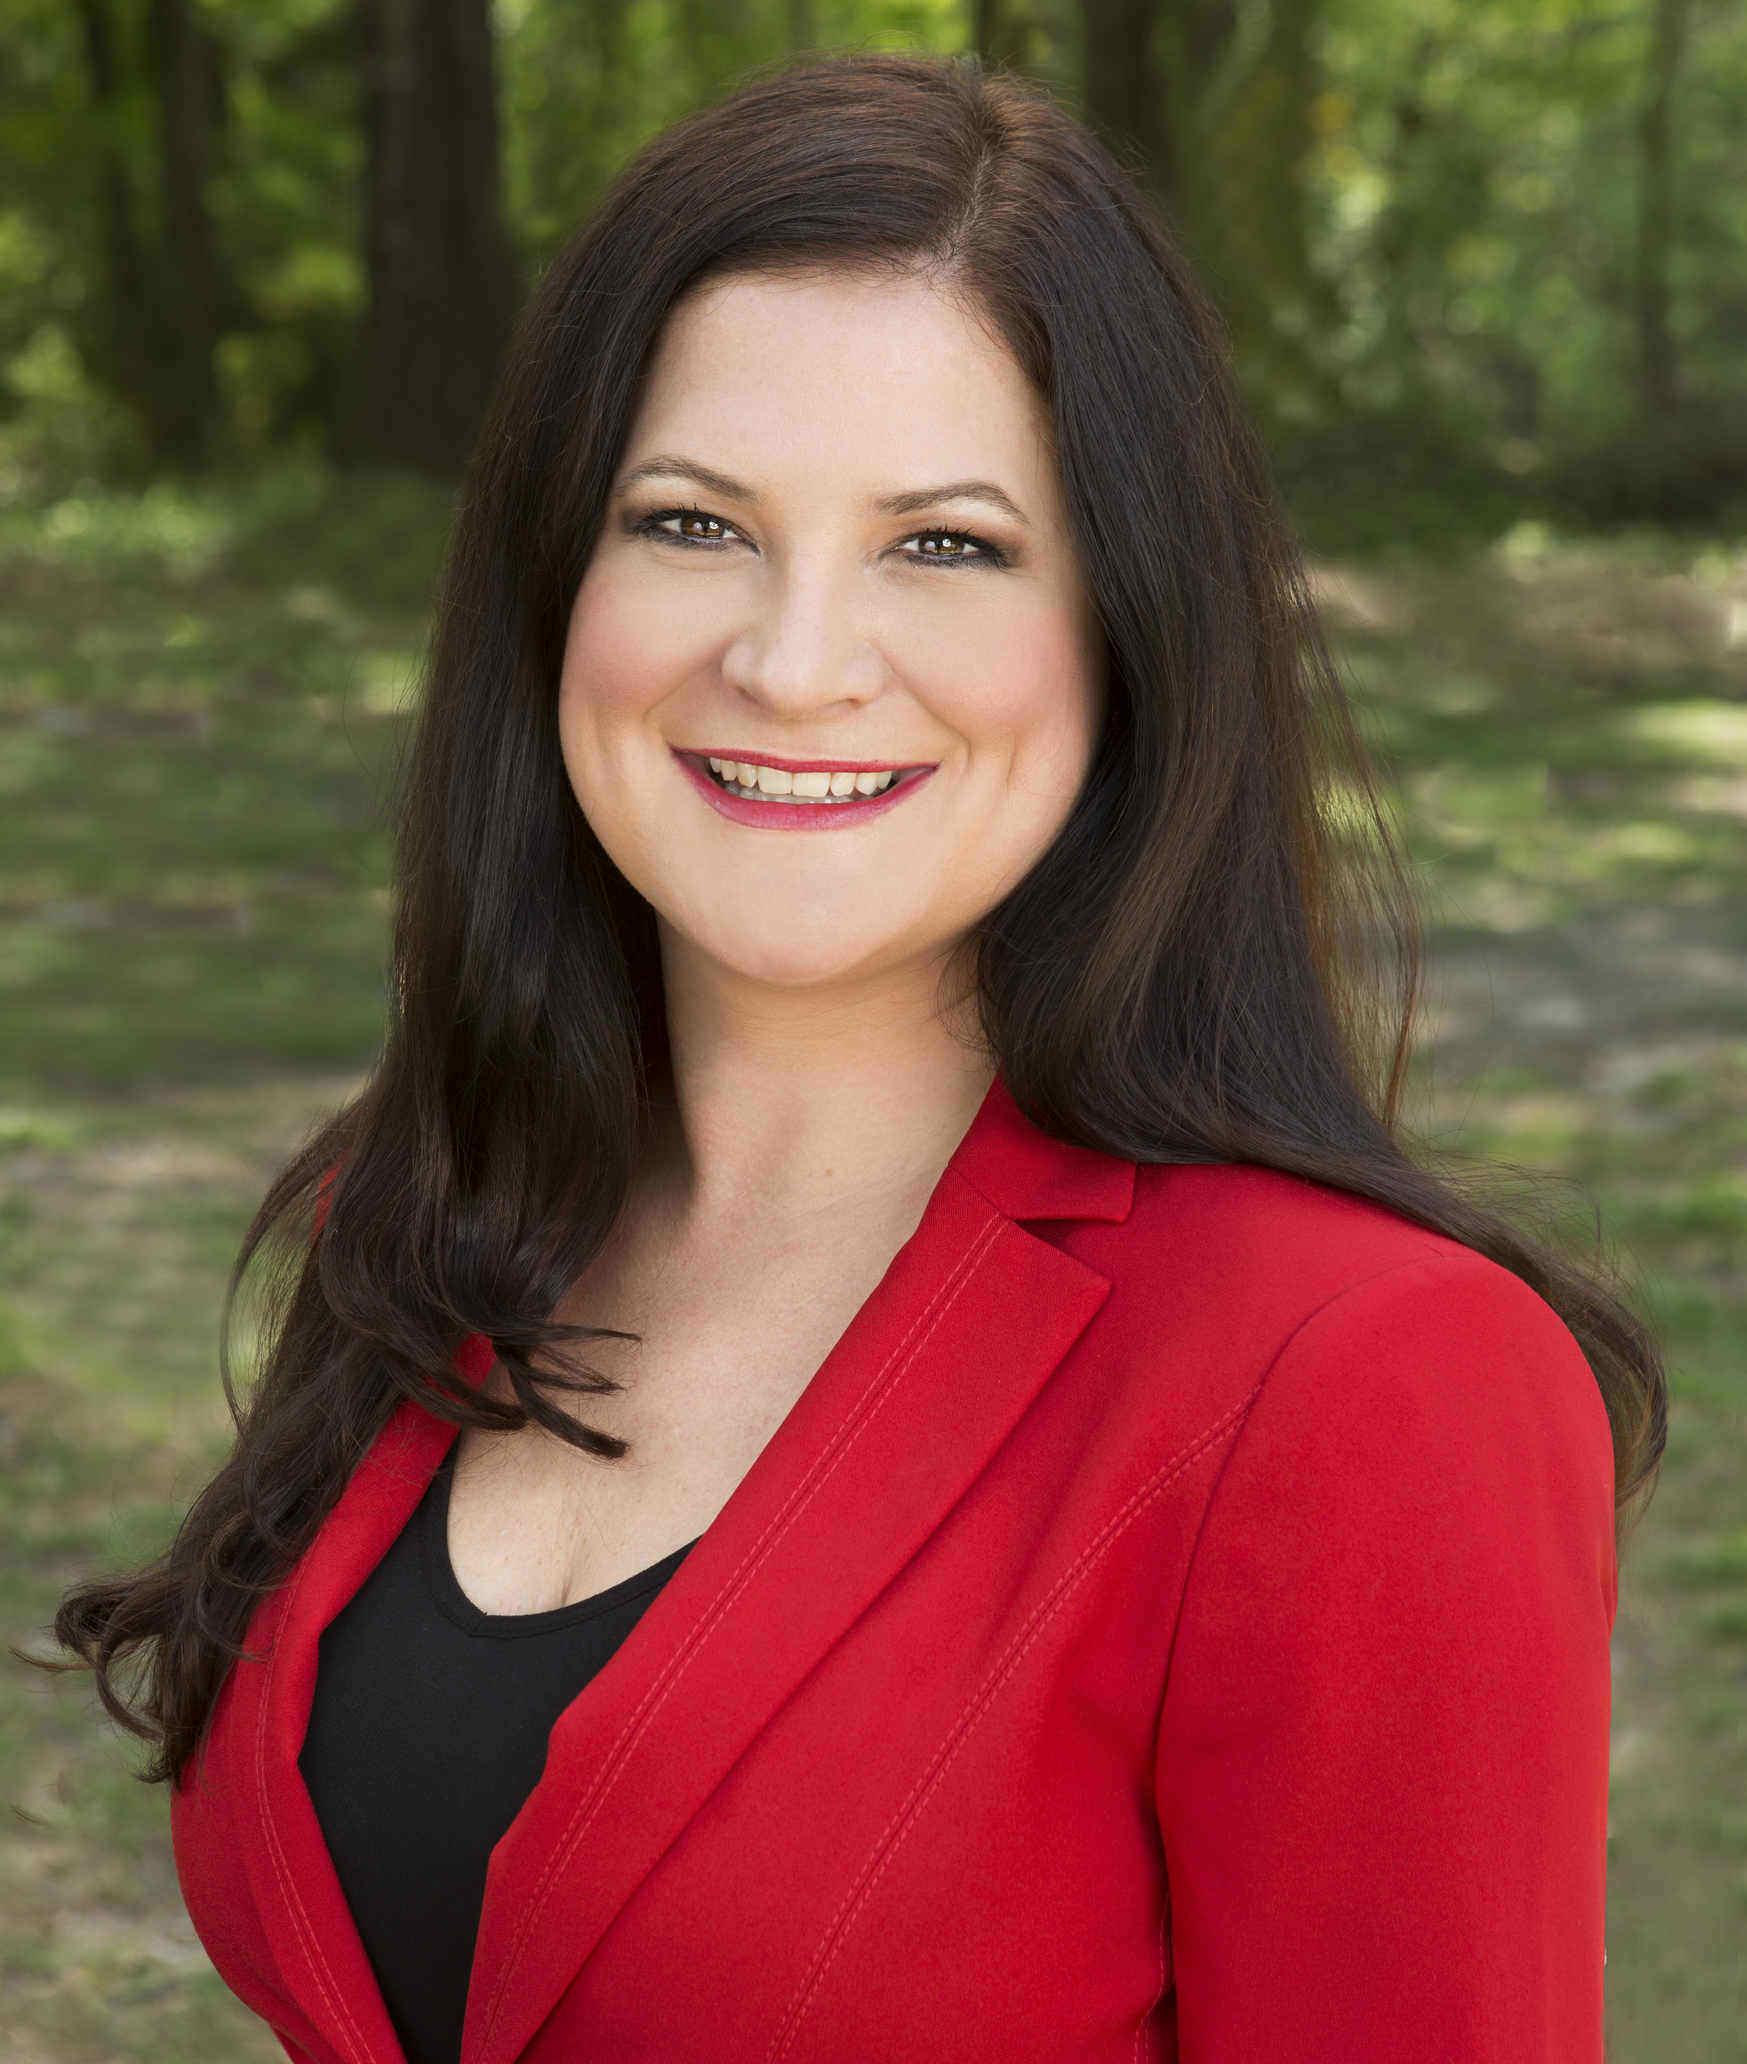 Tiffany Barry Rose